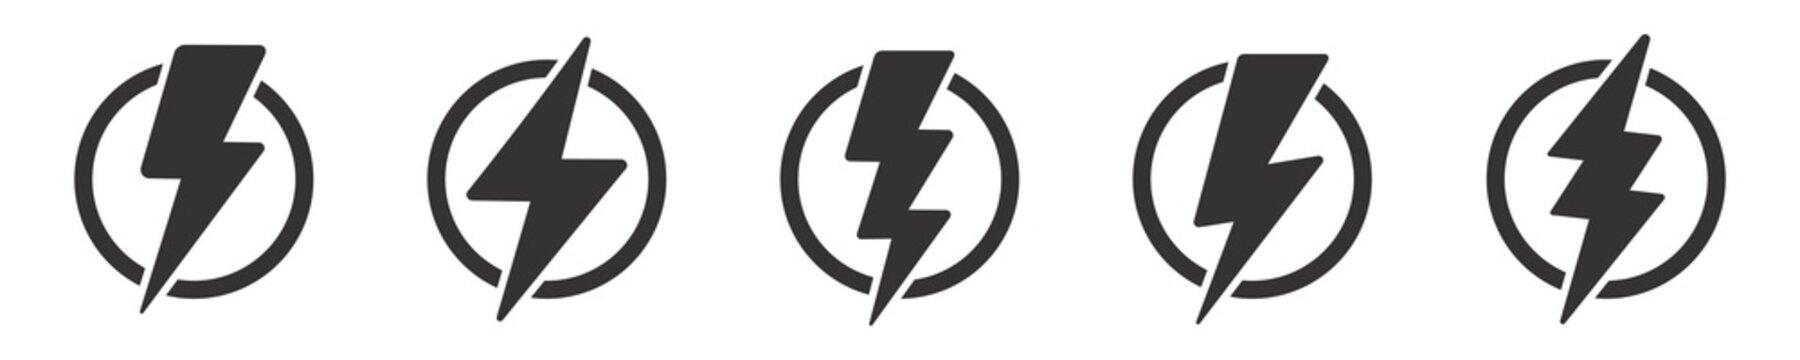 Lightning bolt icon set, Thunderbolt in the circle, flash electric symbol, Vector illustration